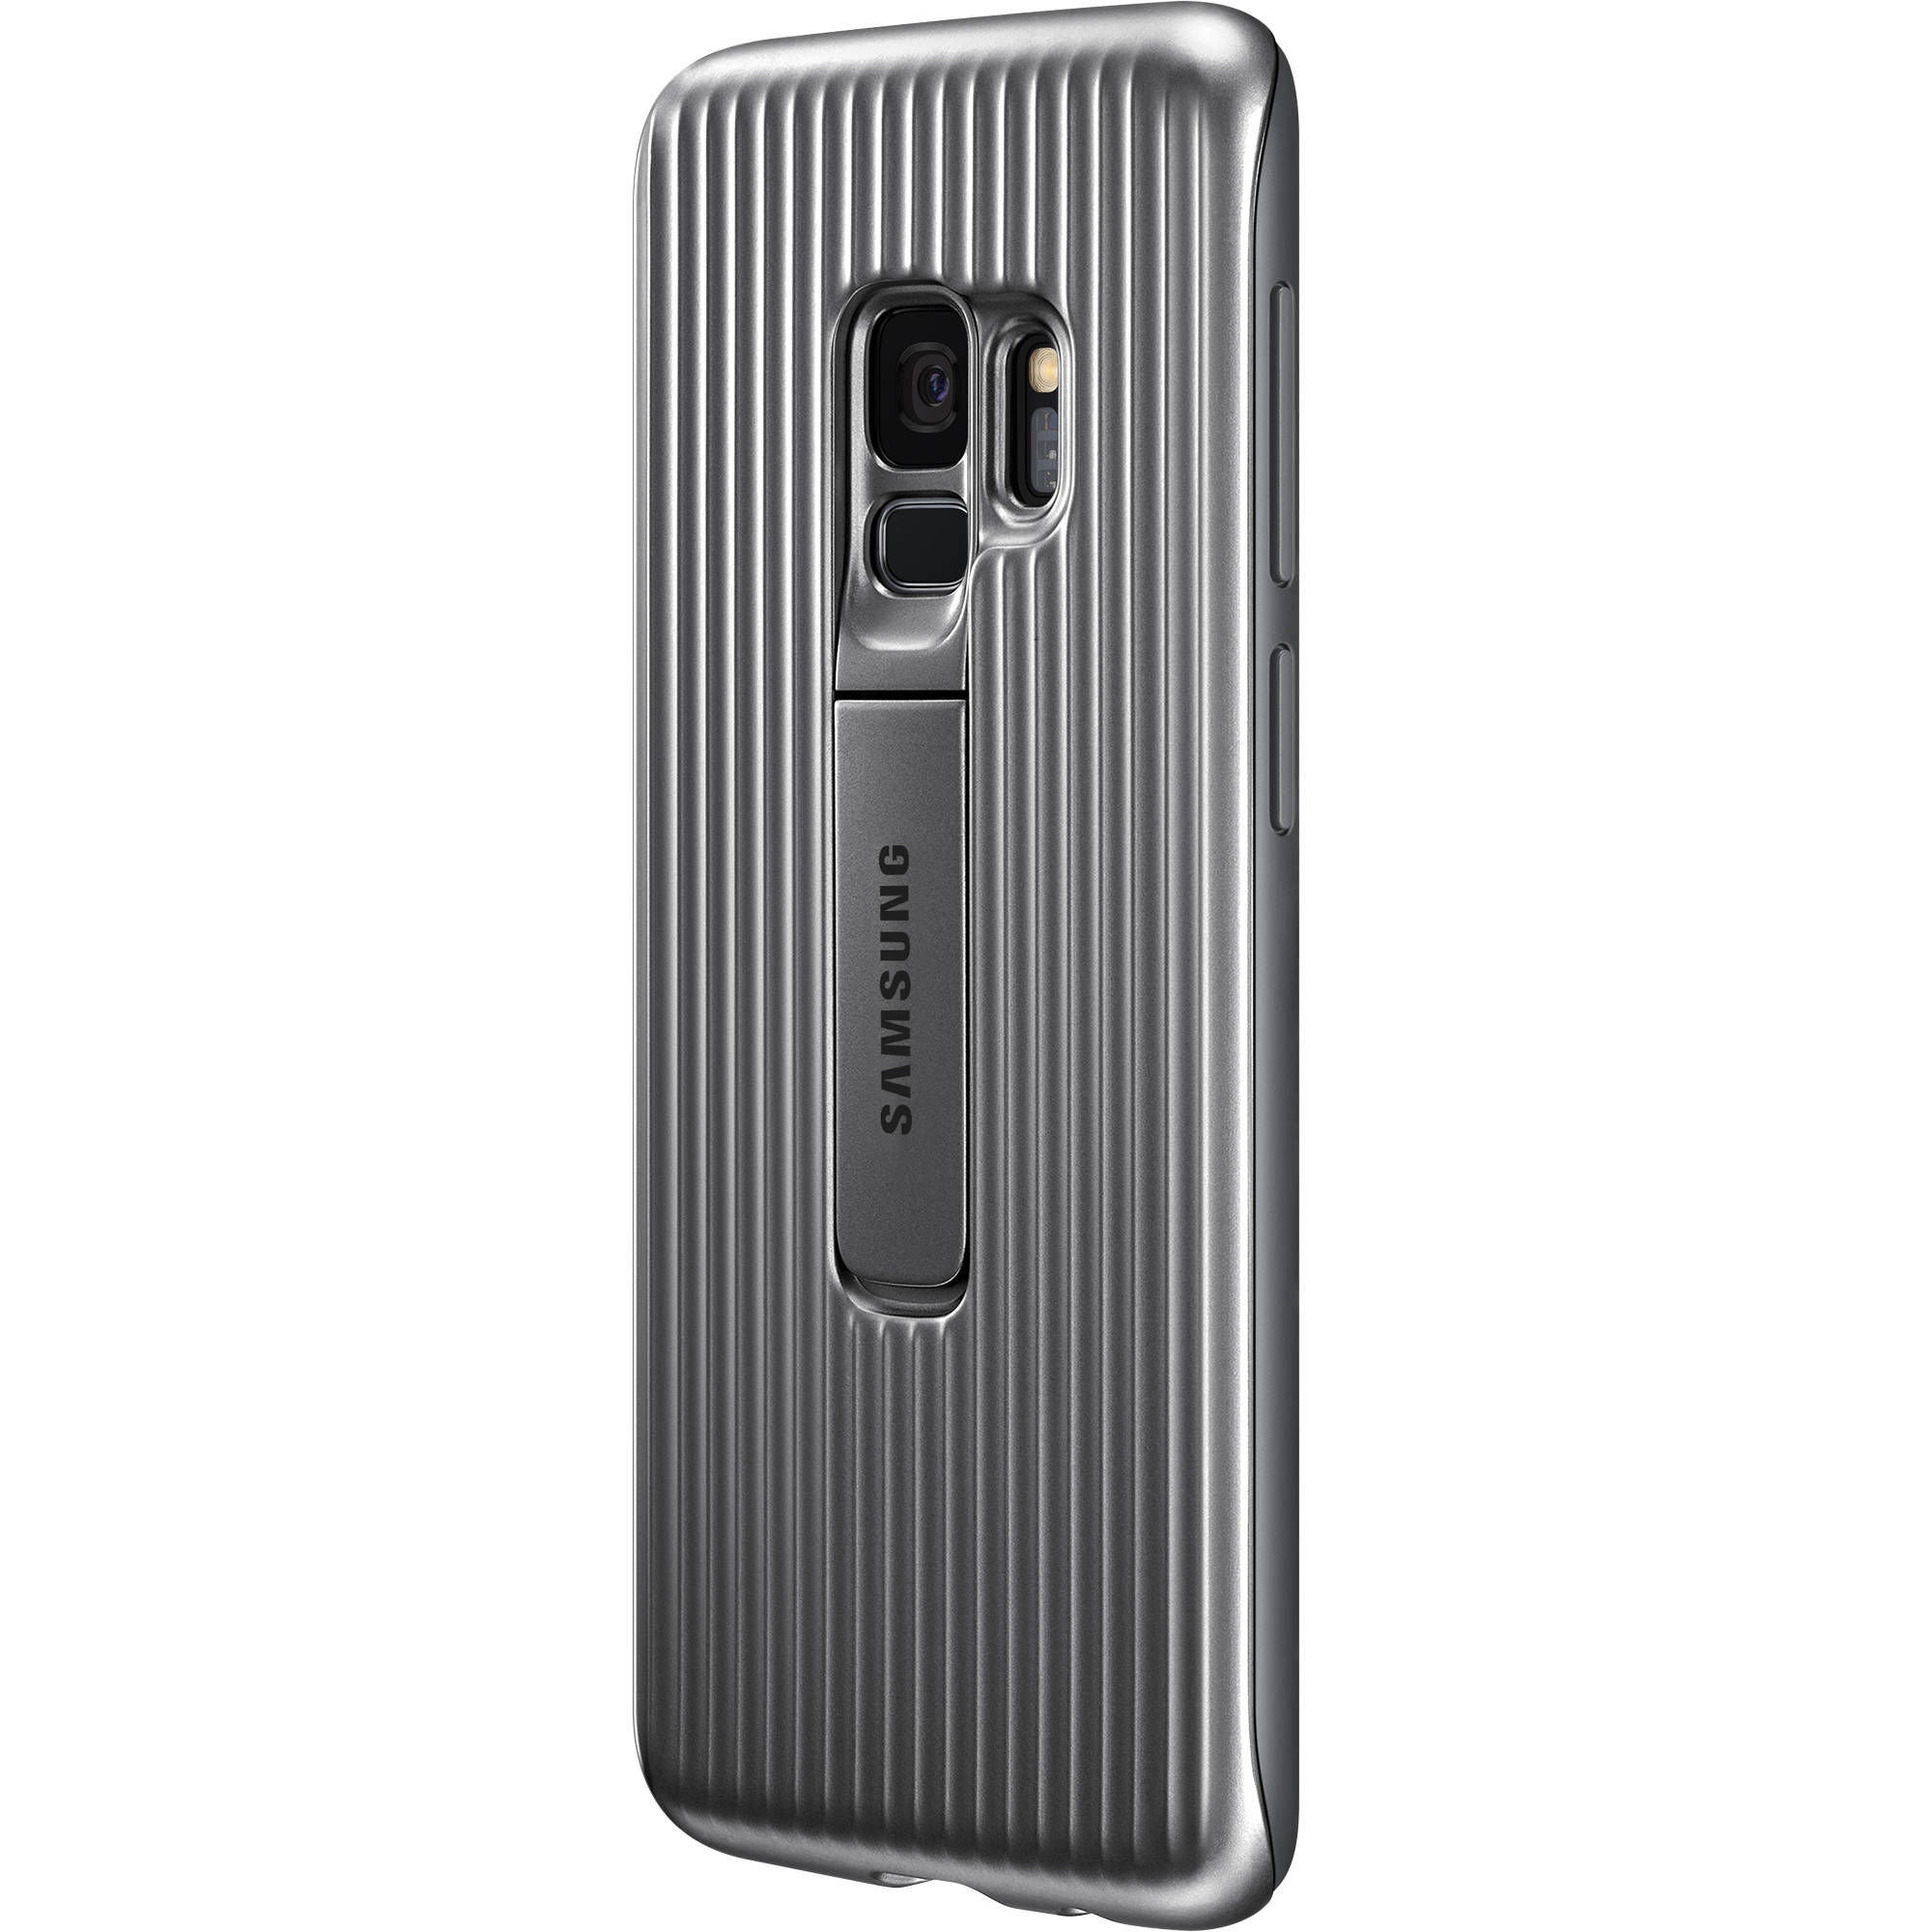 bk croc case phone itm rugged tab for folio inch rotating galaxy rug stand samsung cover